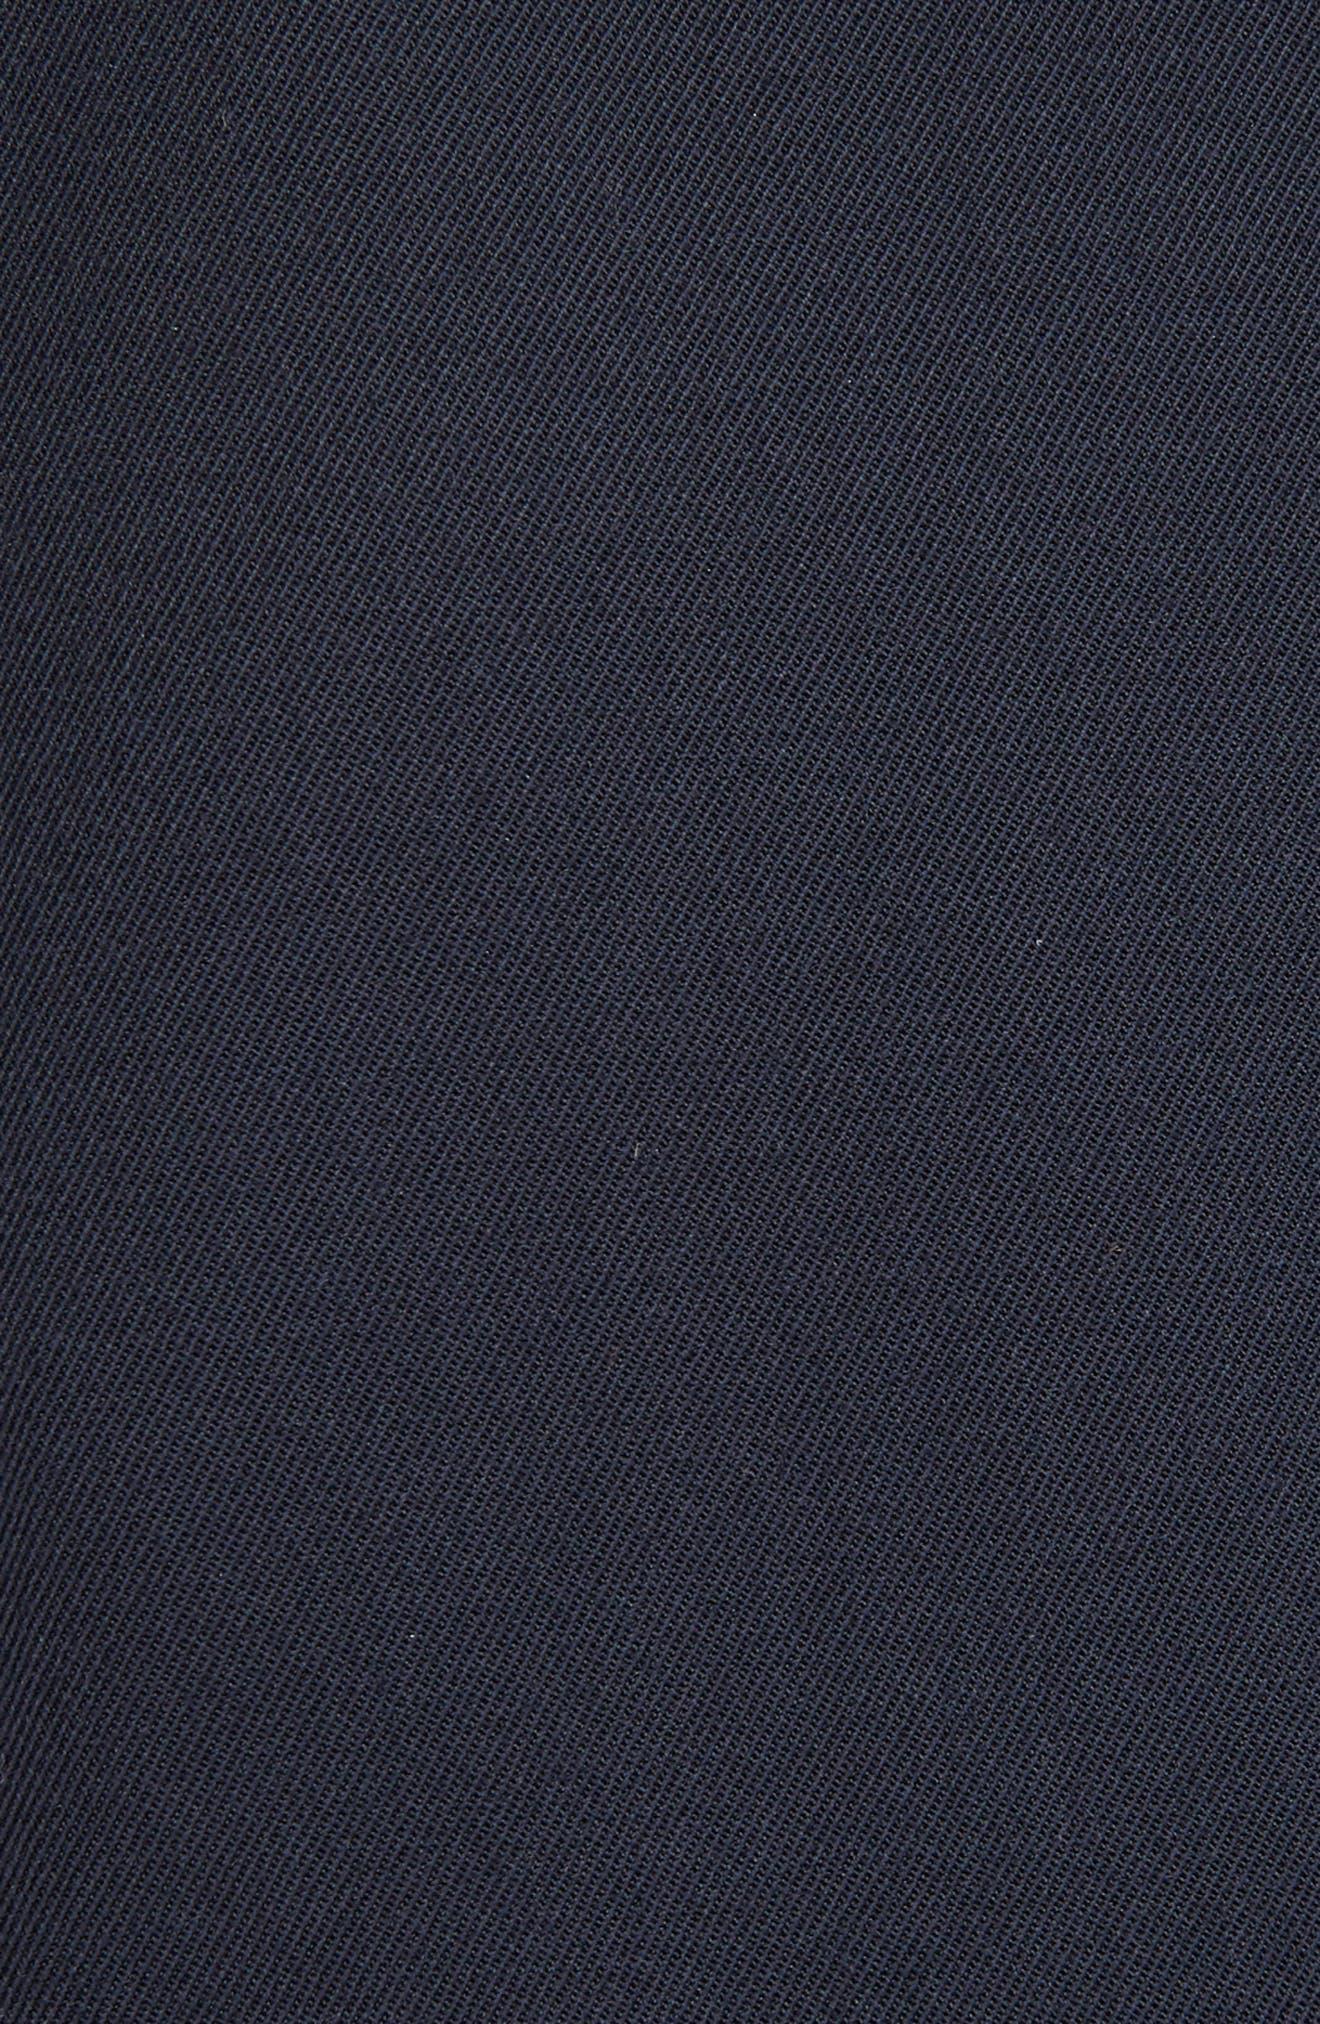 Lace Sleeve Wool Shift Dress,                             Alternate thumbnail 5, color,                             400